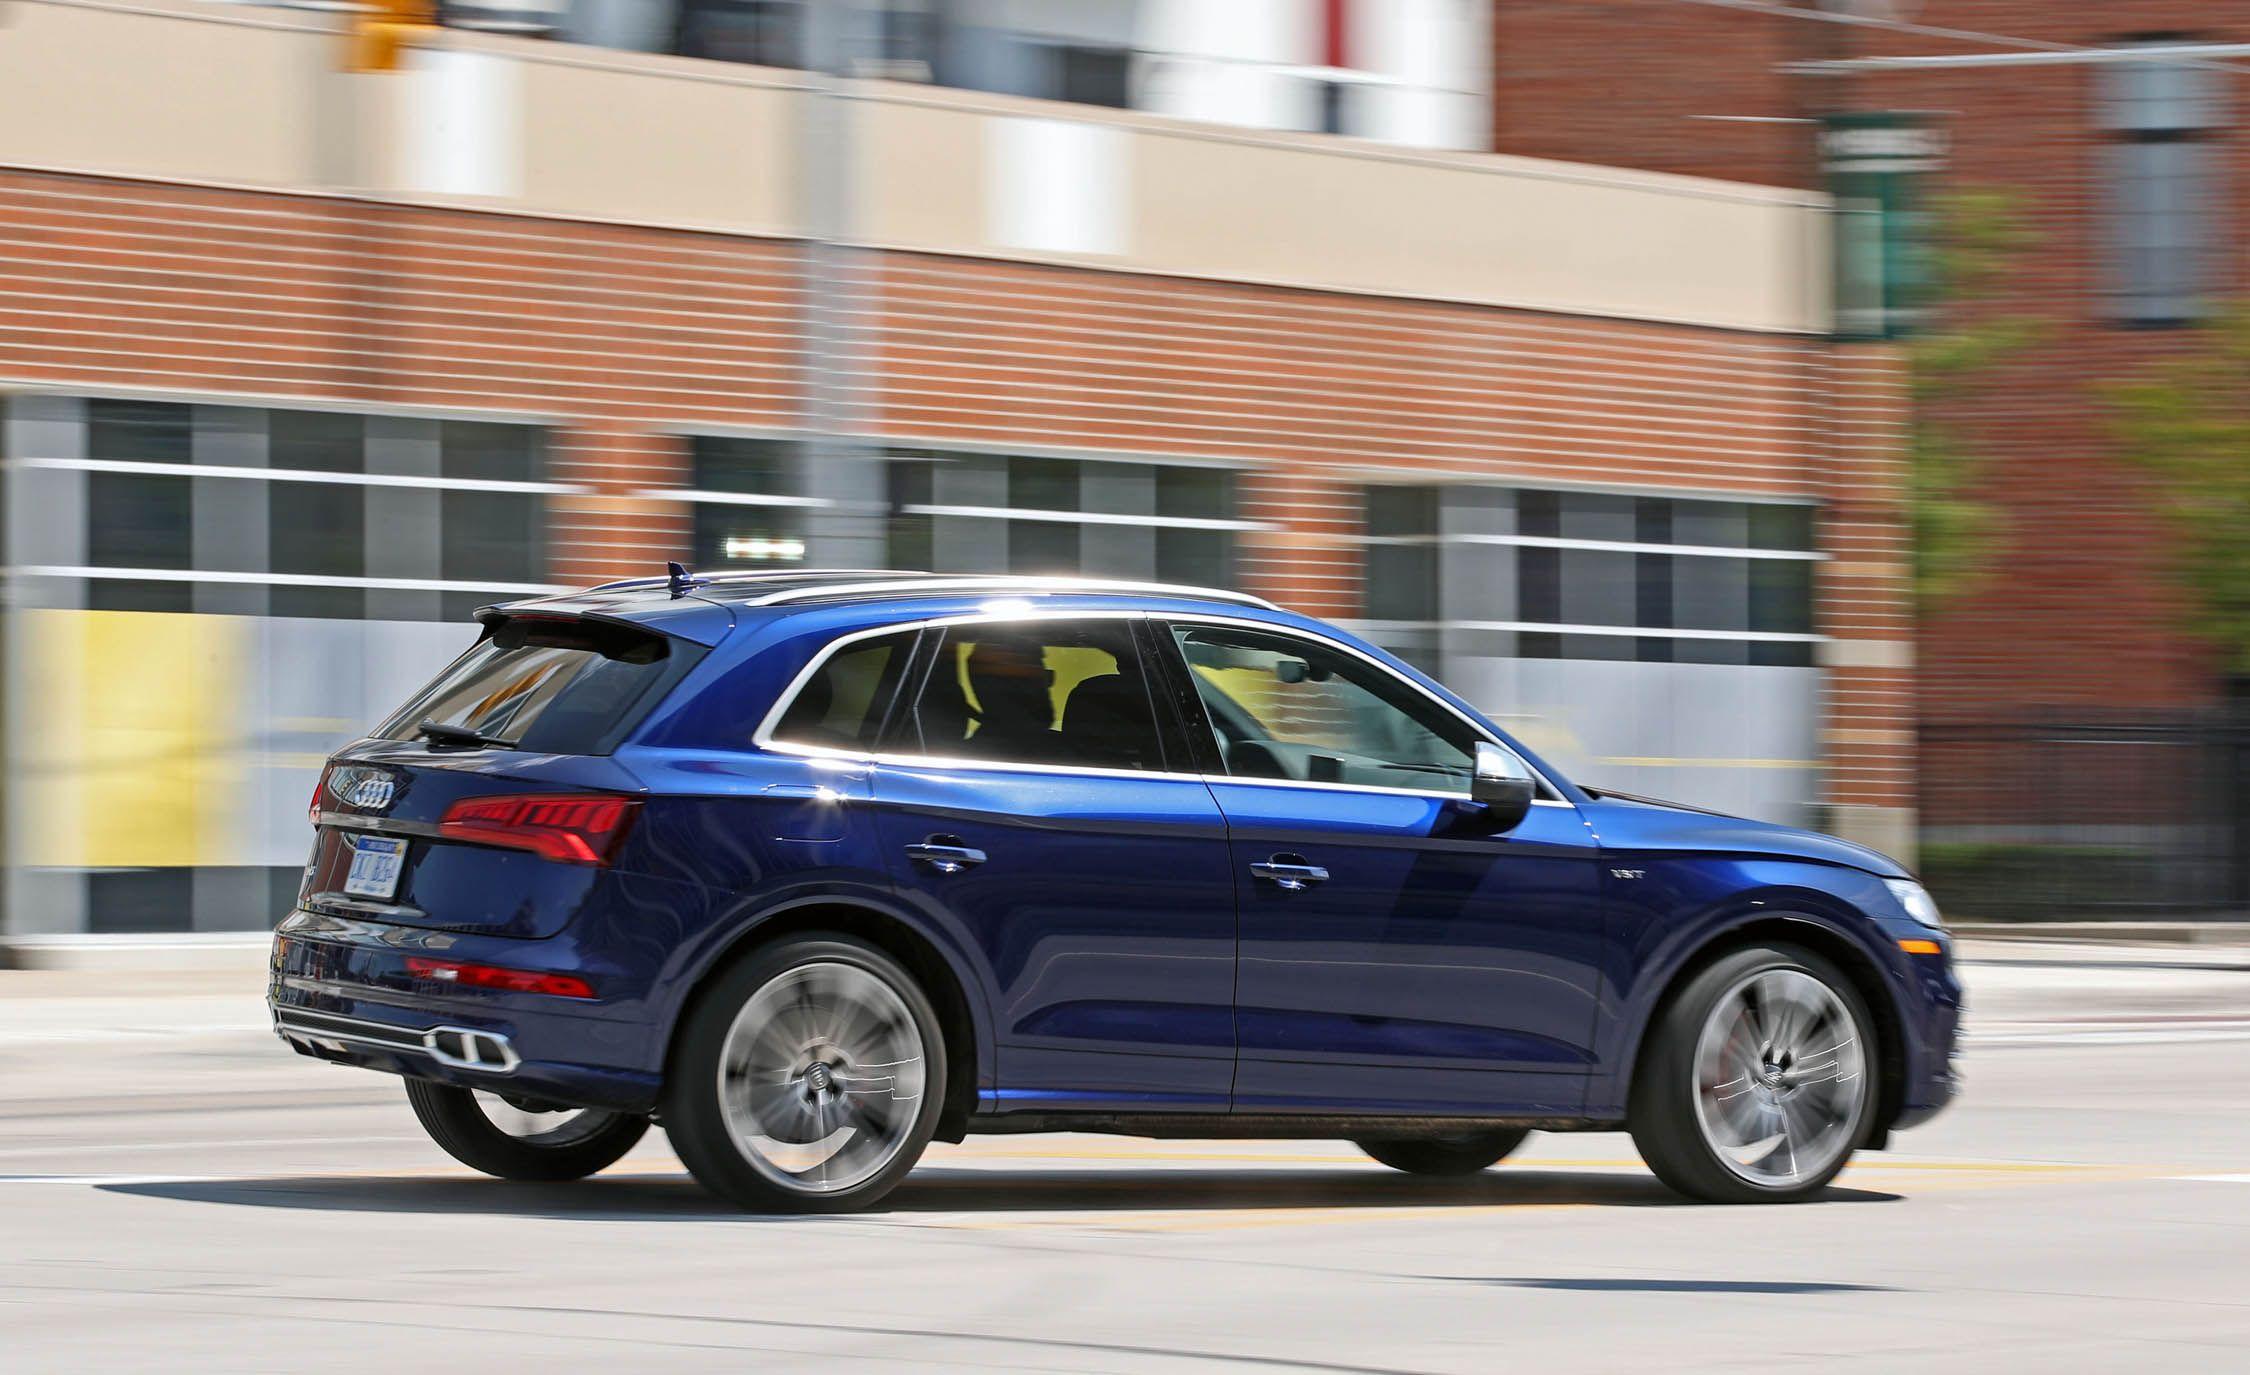 2018 Audi SQ5 Fuel Economy Review